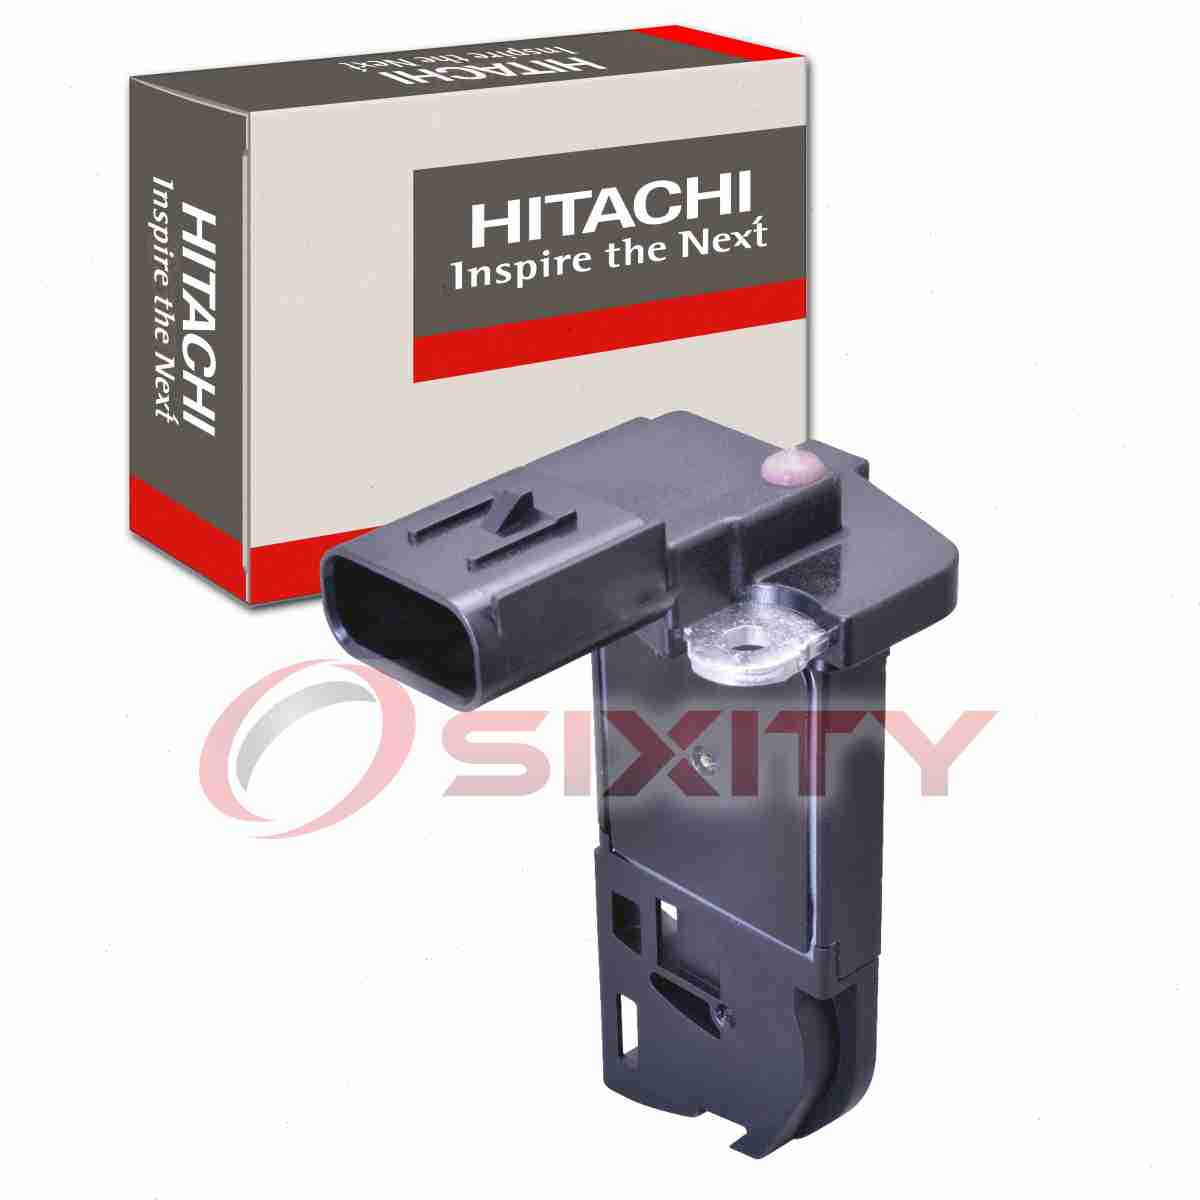 Mass Air Flow Sensor Hitachi MAF0081